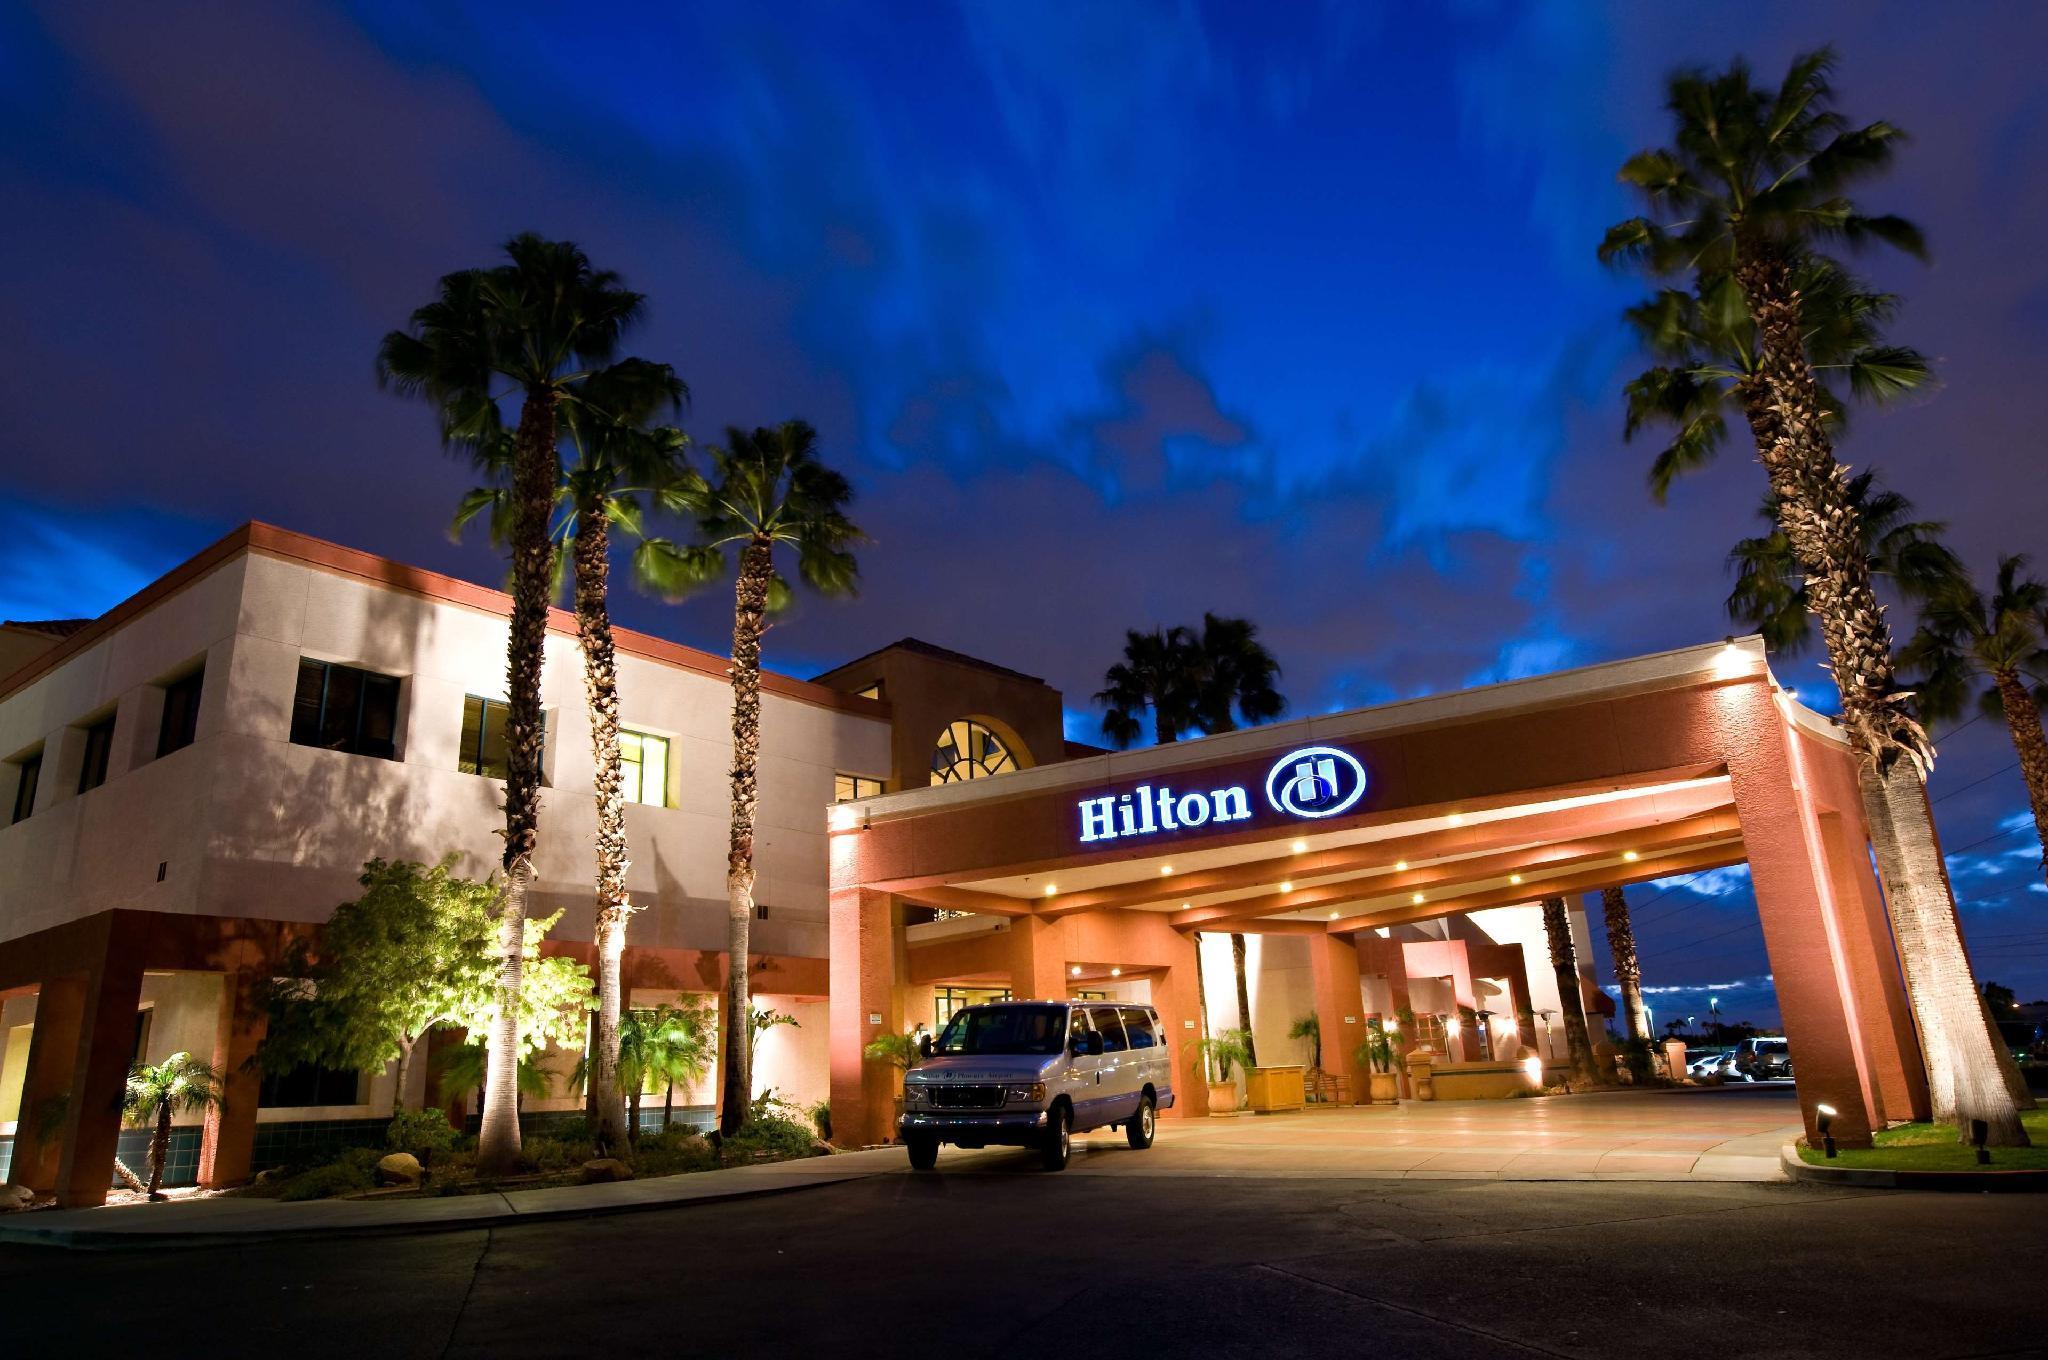 Hilton Phoenix Airport Hotel image